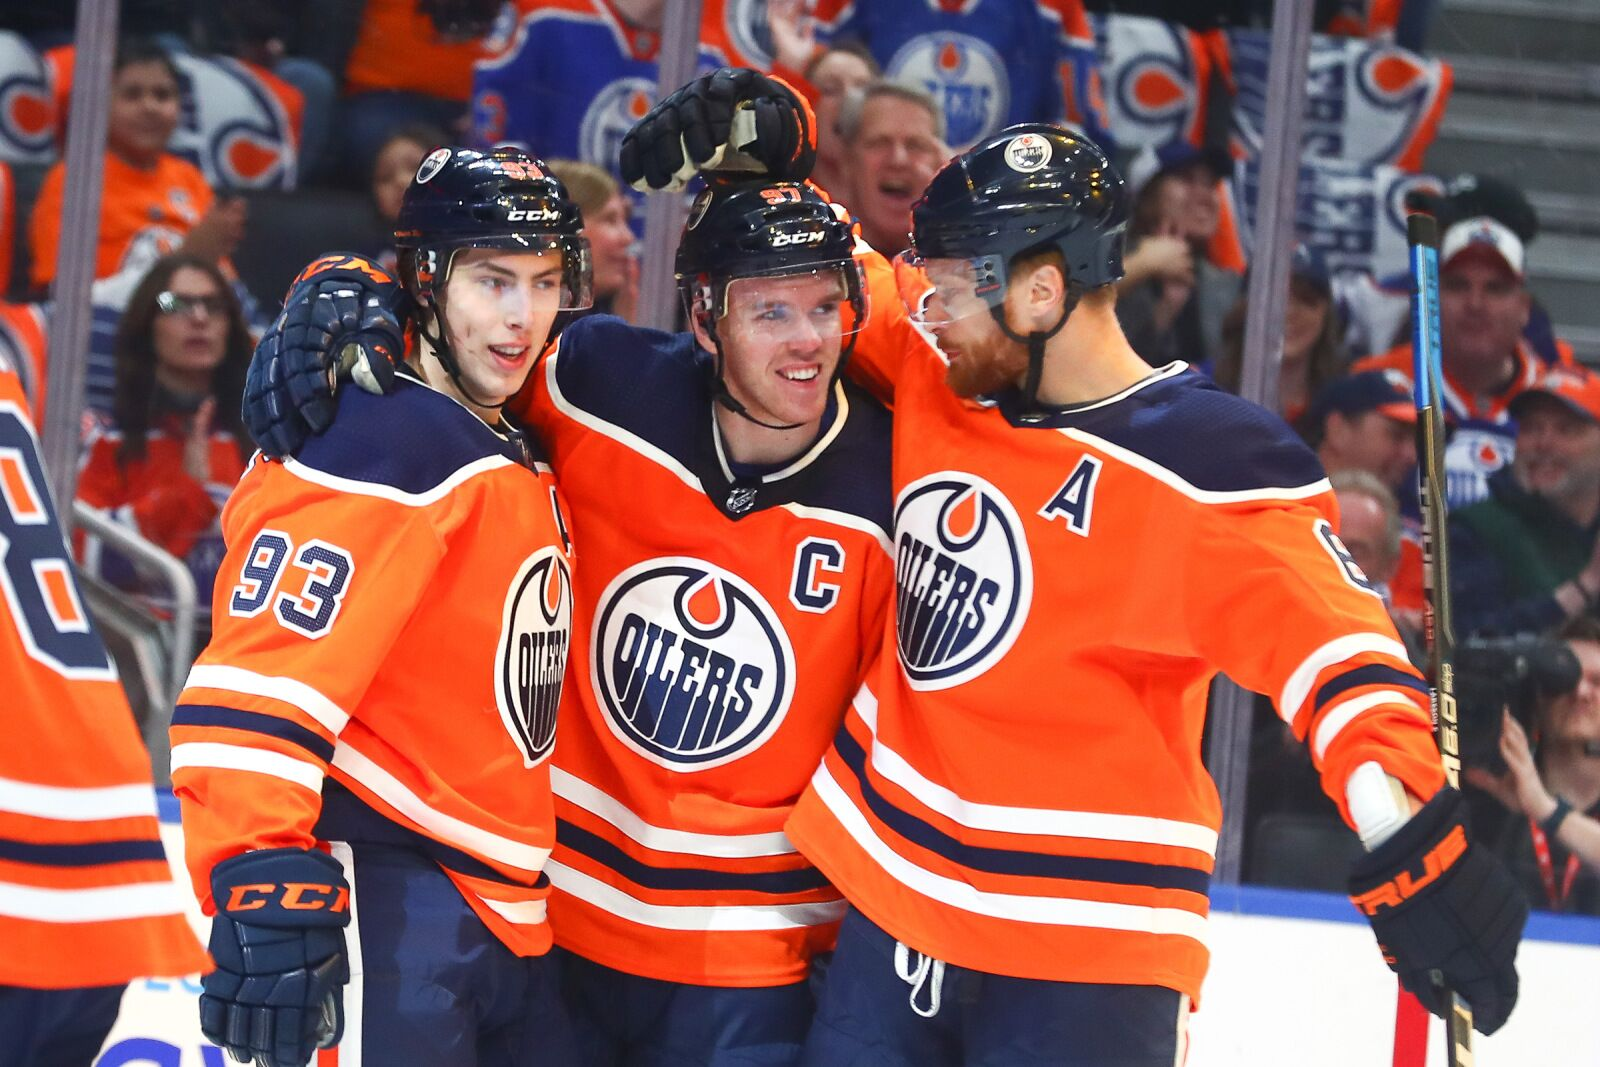 Edmonton Ab March  Edmonton Oilers Center Connor Mcdavid  Celebrates